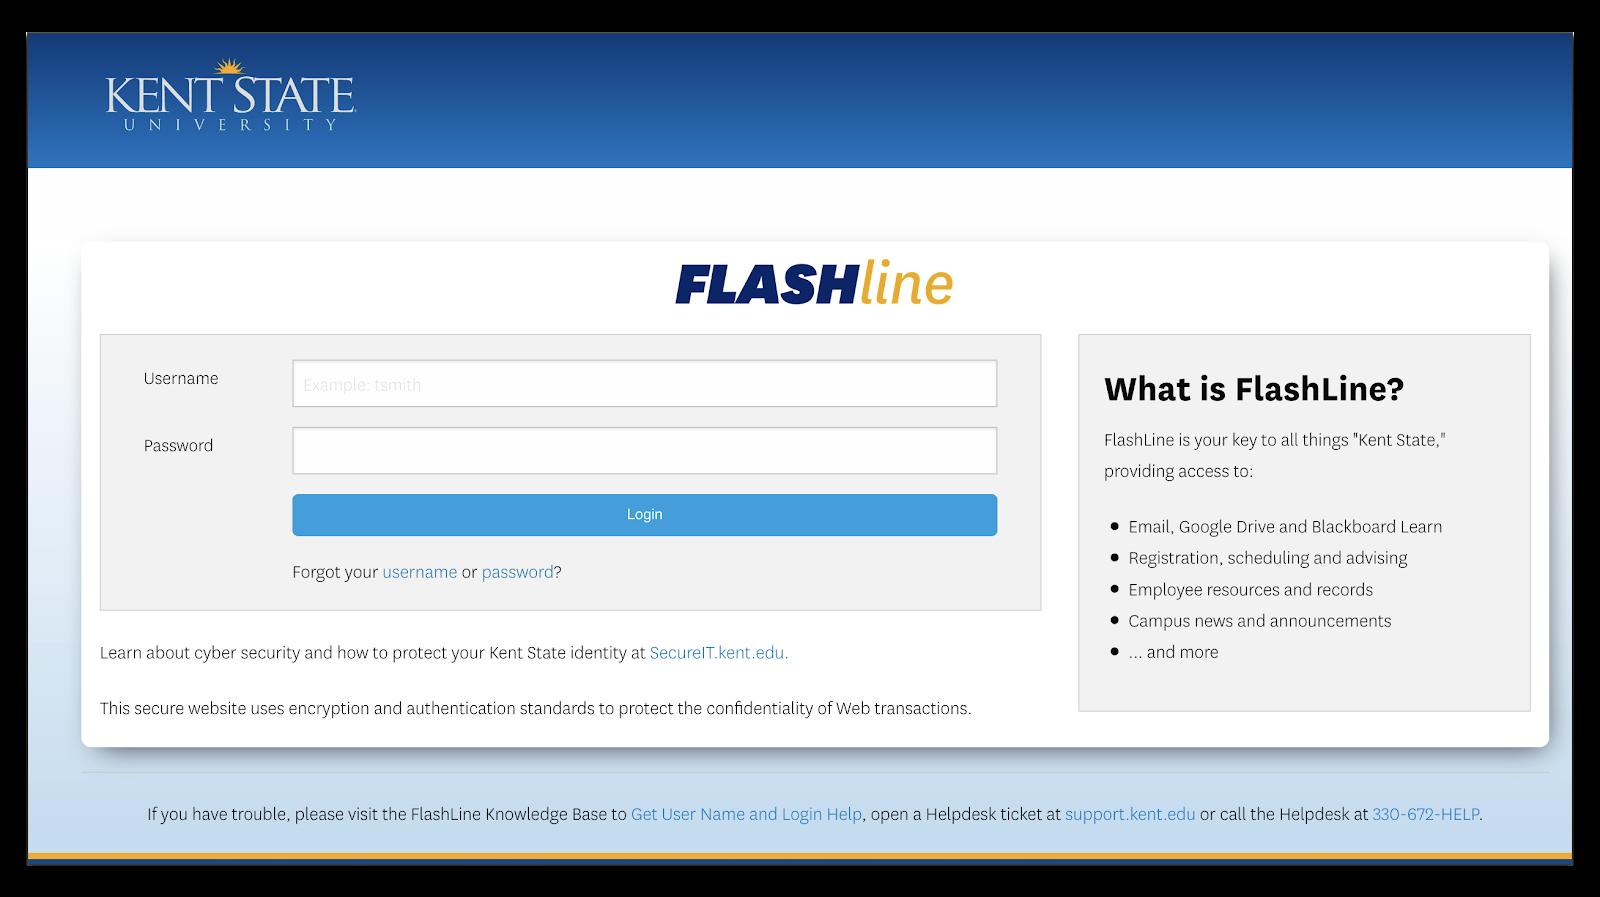 Image of Flashline login page